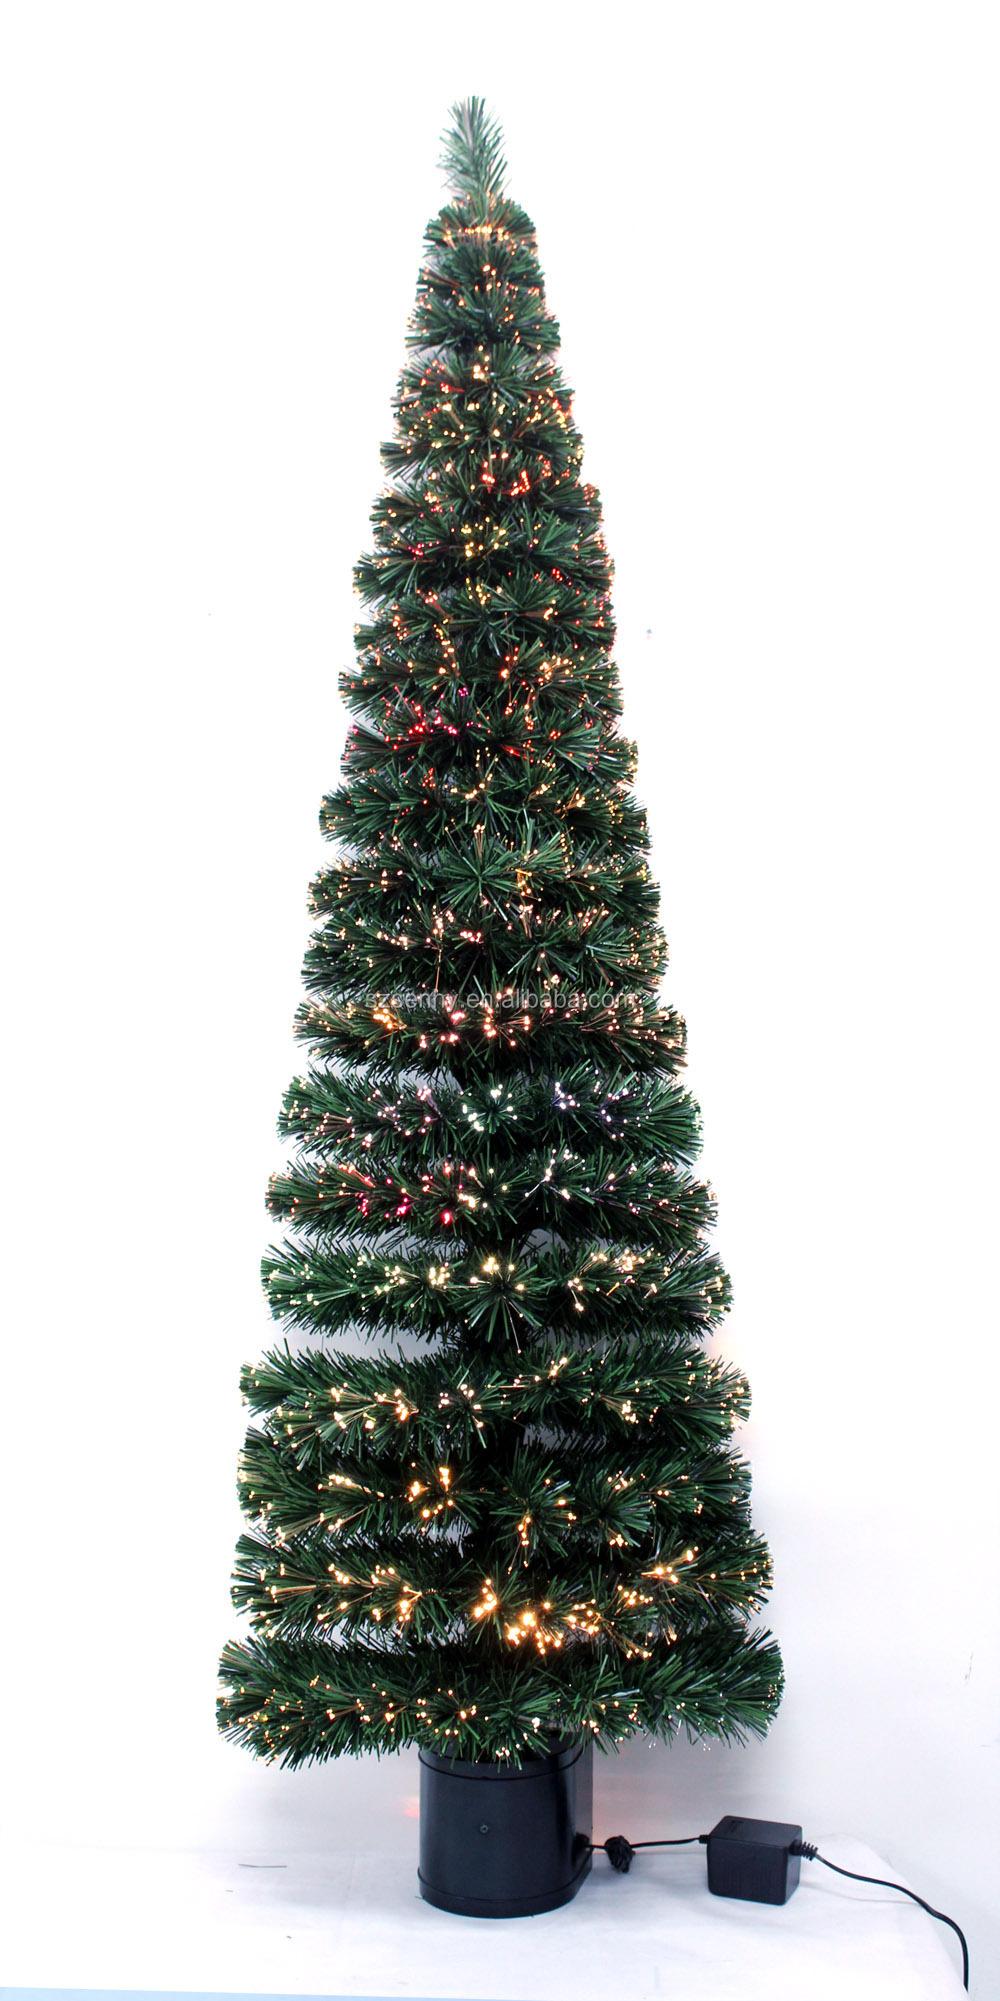 Fiber Optic Christmas Tree Power Supply Buy Fiber Optic  - Fiber Optic Christmas Tree Power Supply